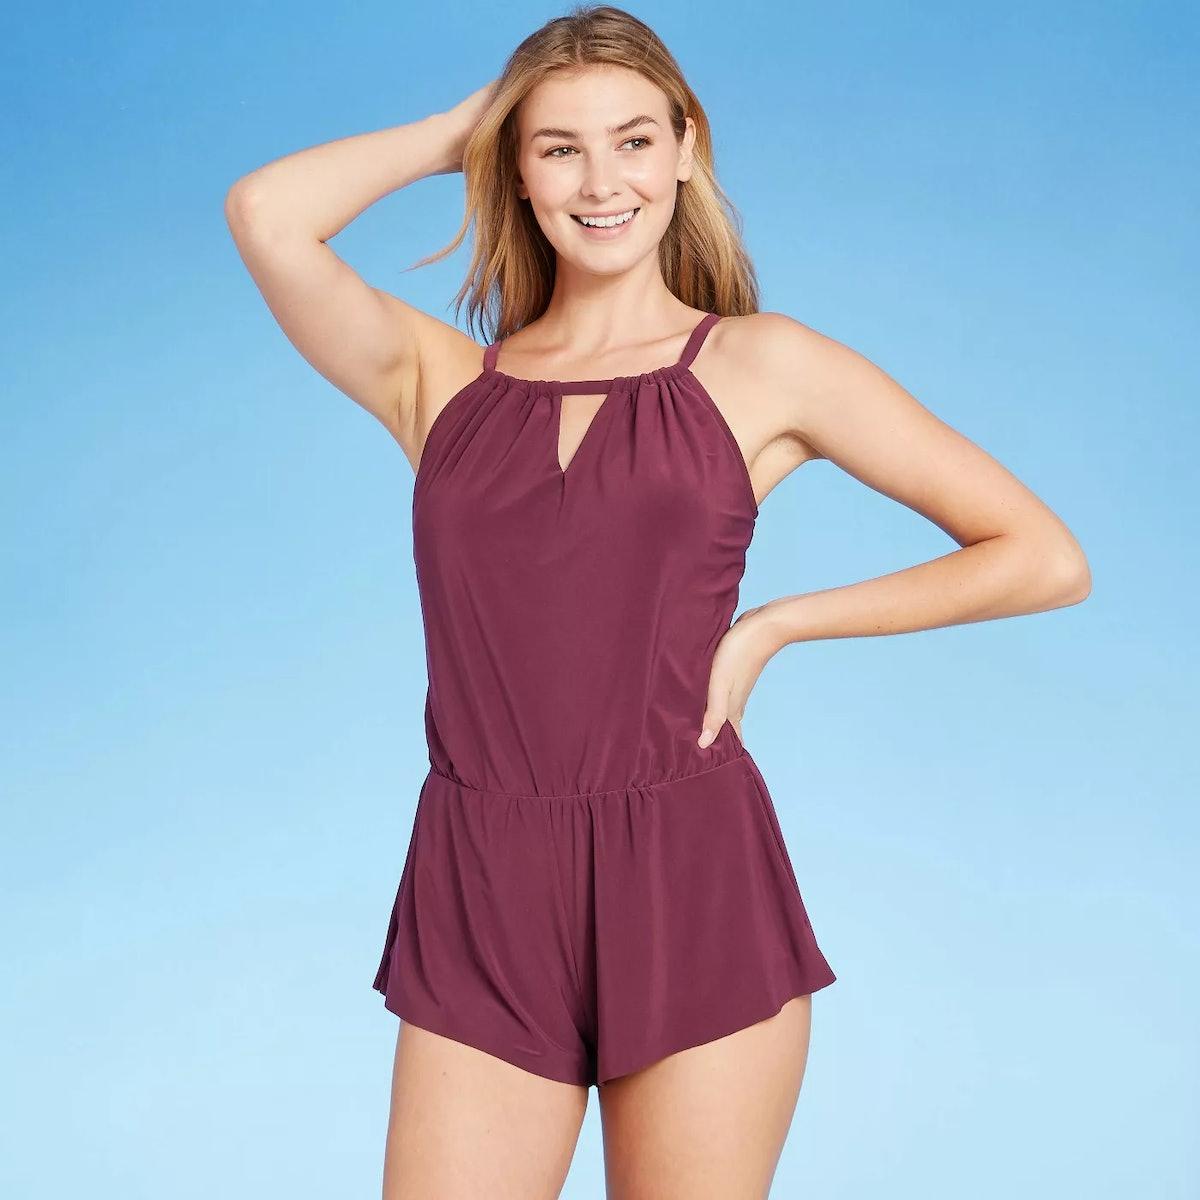 Aqua Green Women's High Neck Swim Romper with Pockets